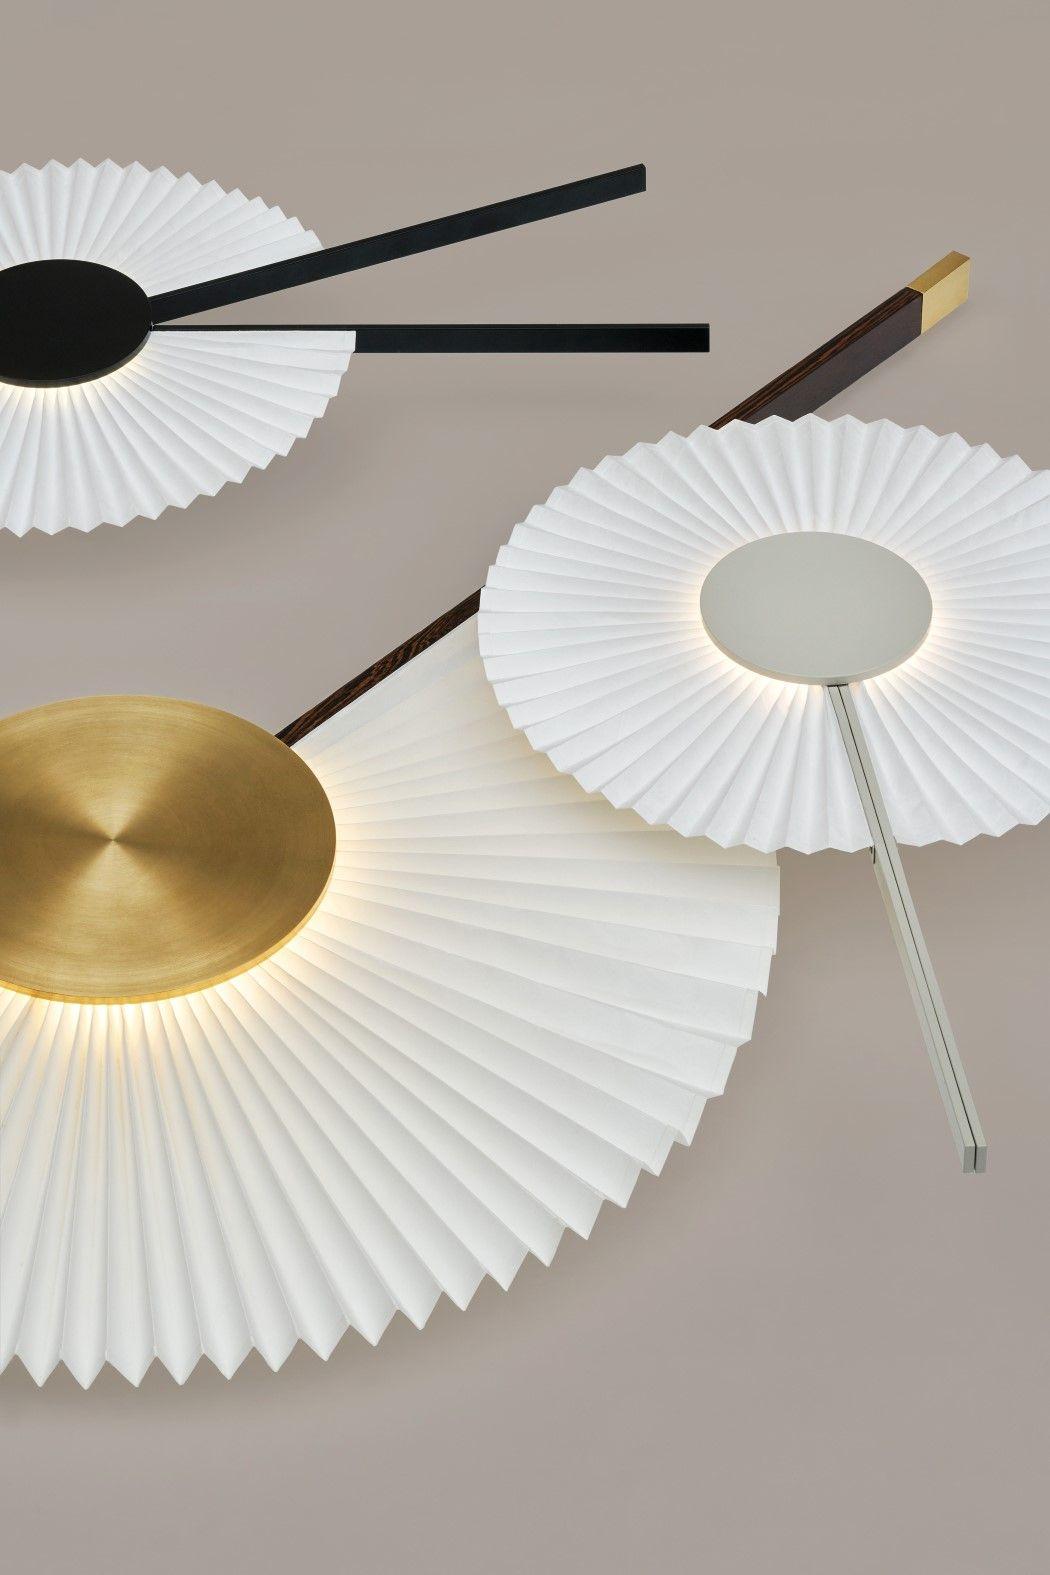 pingl par sol ne sur designer en 2019 applique murale. Black Bedroom Furniture Sets. Home Design Ideas